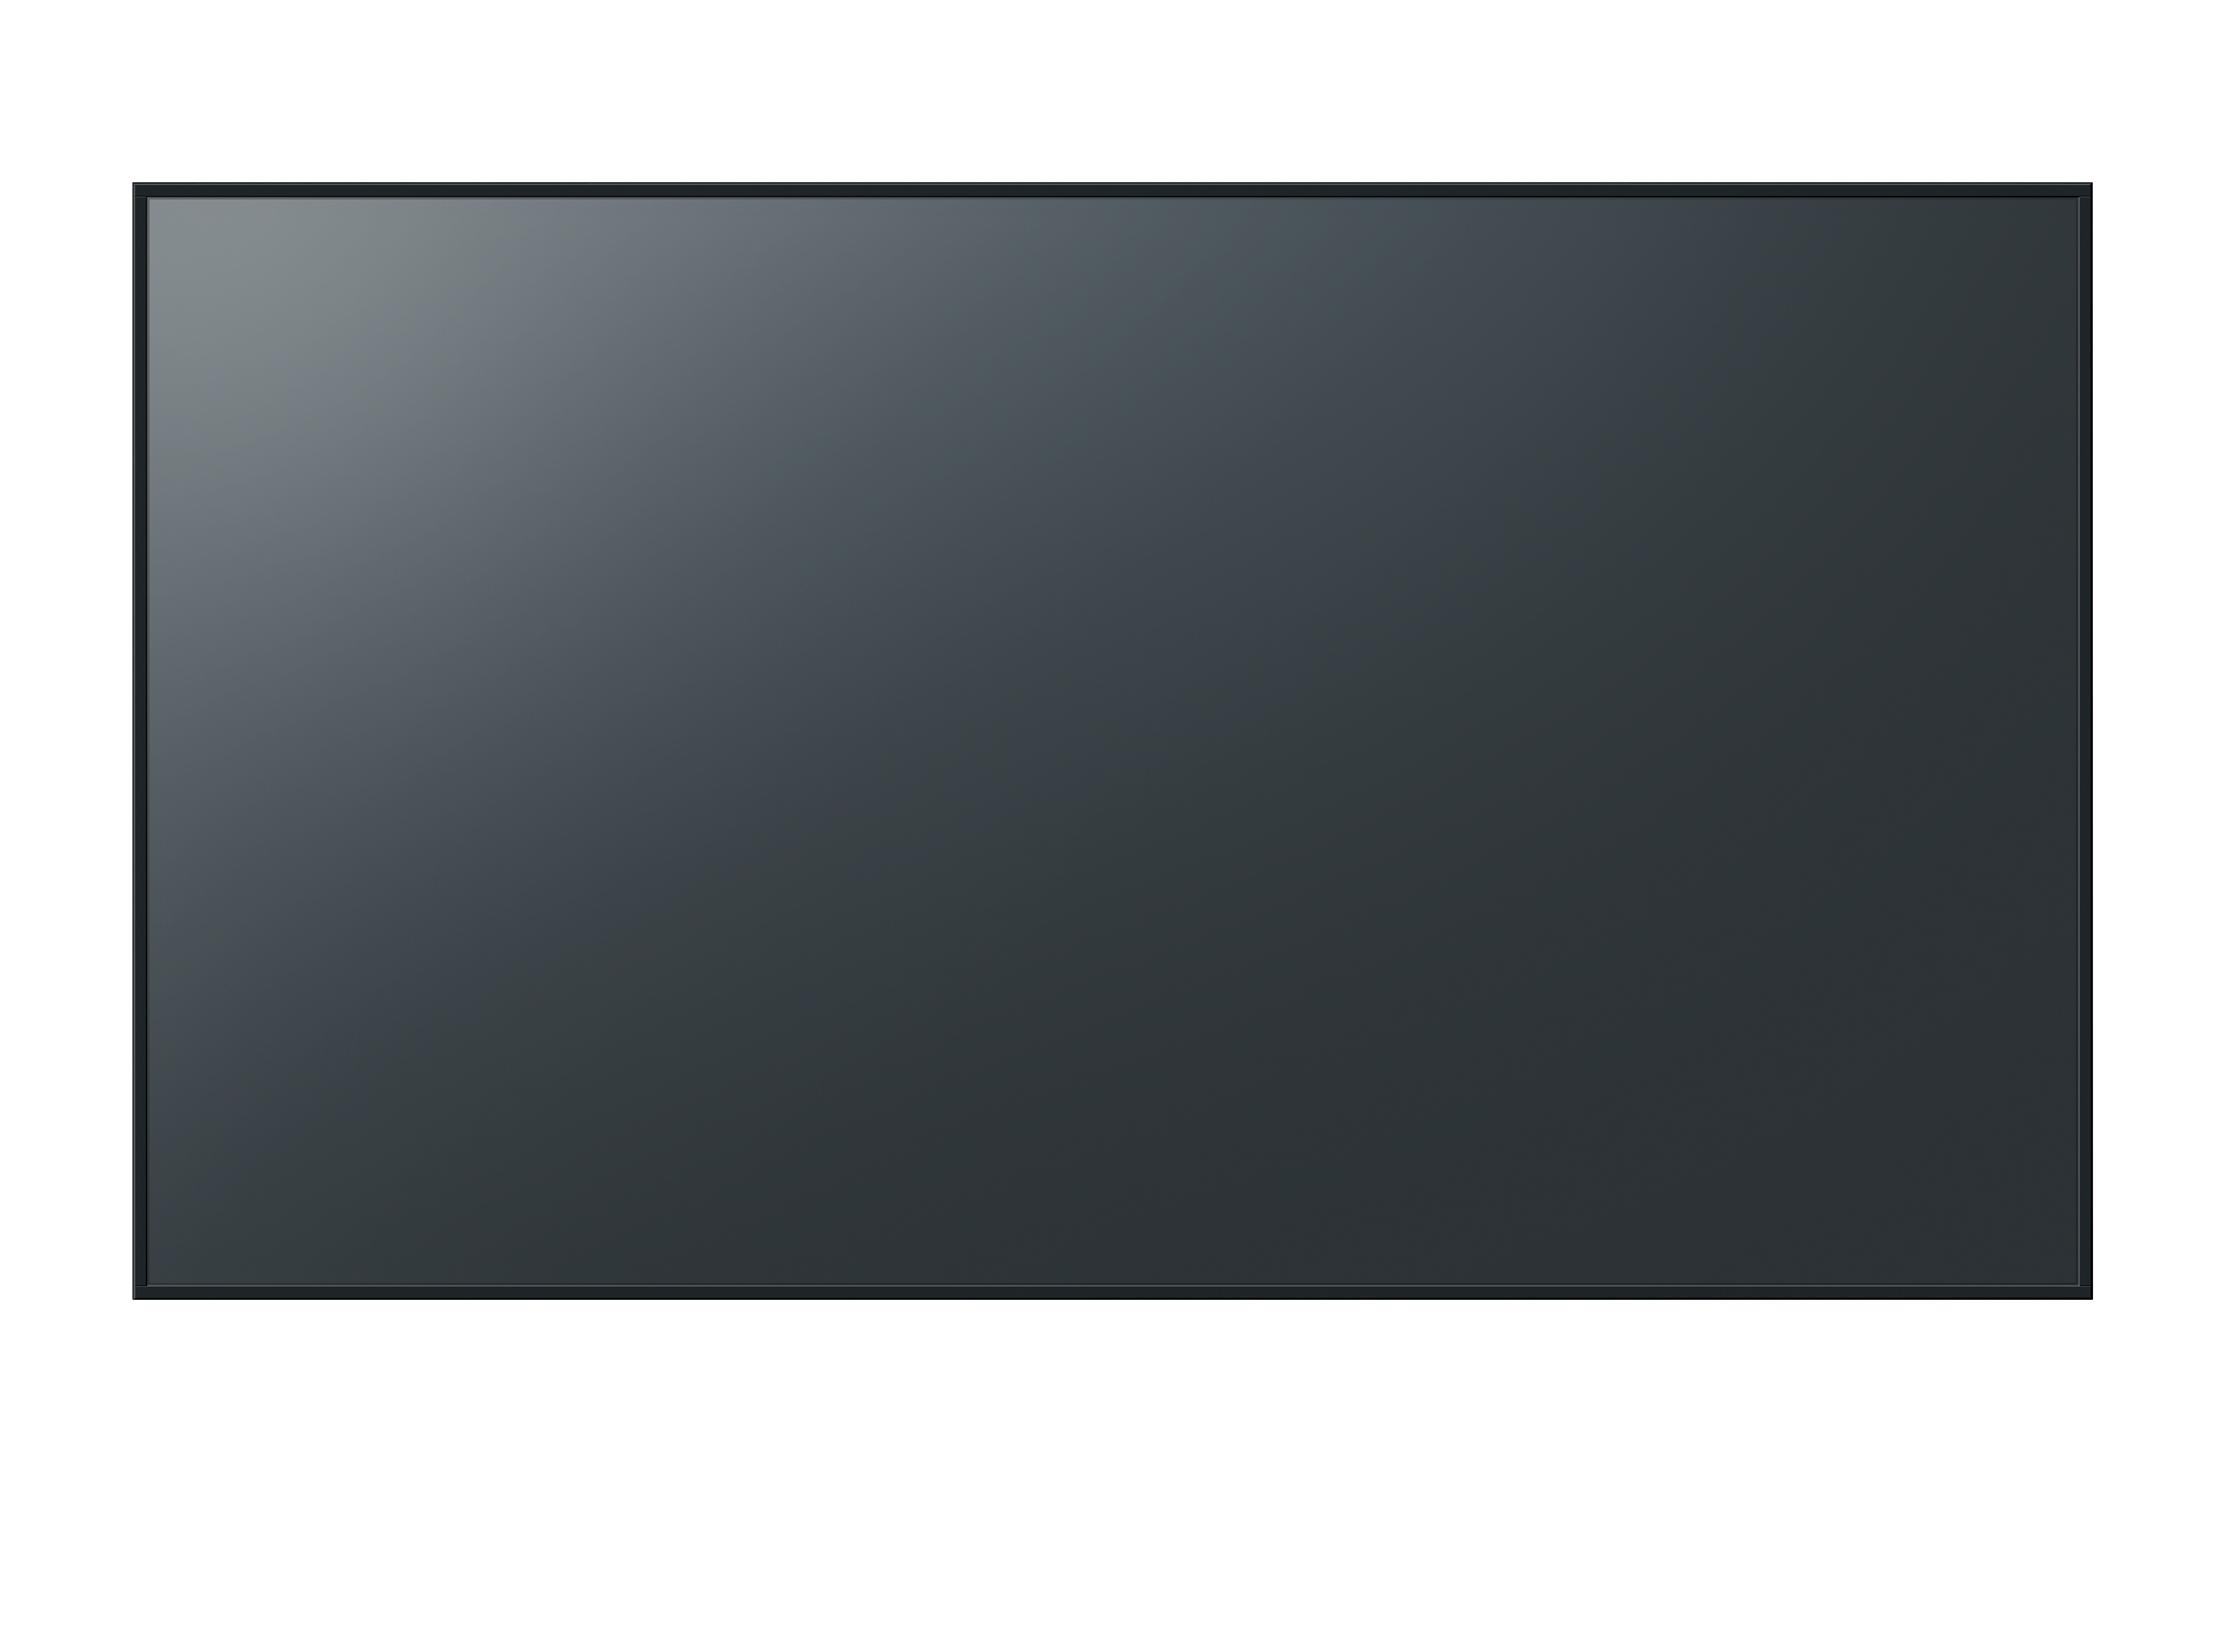 PANASONIC PANASONIC TH-50EQ1 - Ecran professionnel Résolution UHD 4K, 350 cd - 50``